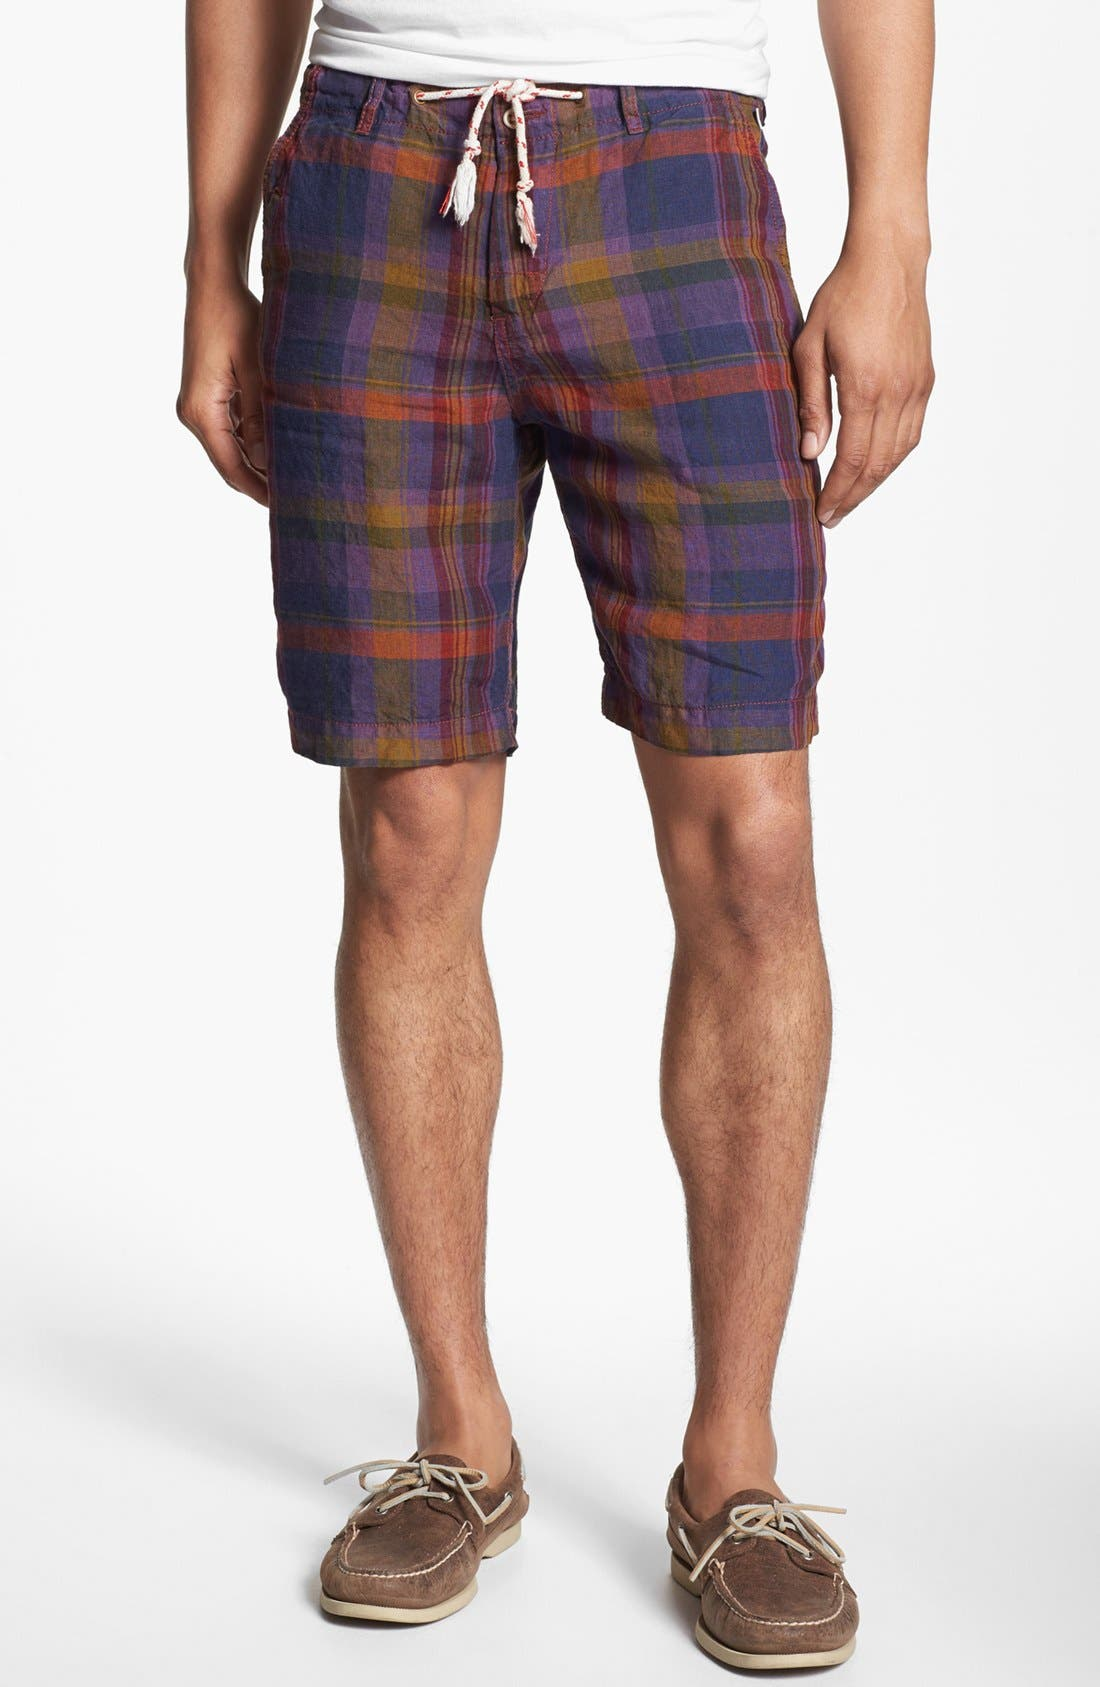 Alternate Image 1 Selected - Shirt by Shirt 'Guam' Plaid Shorts